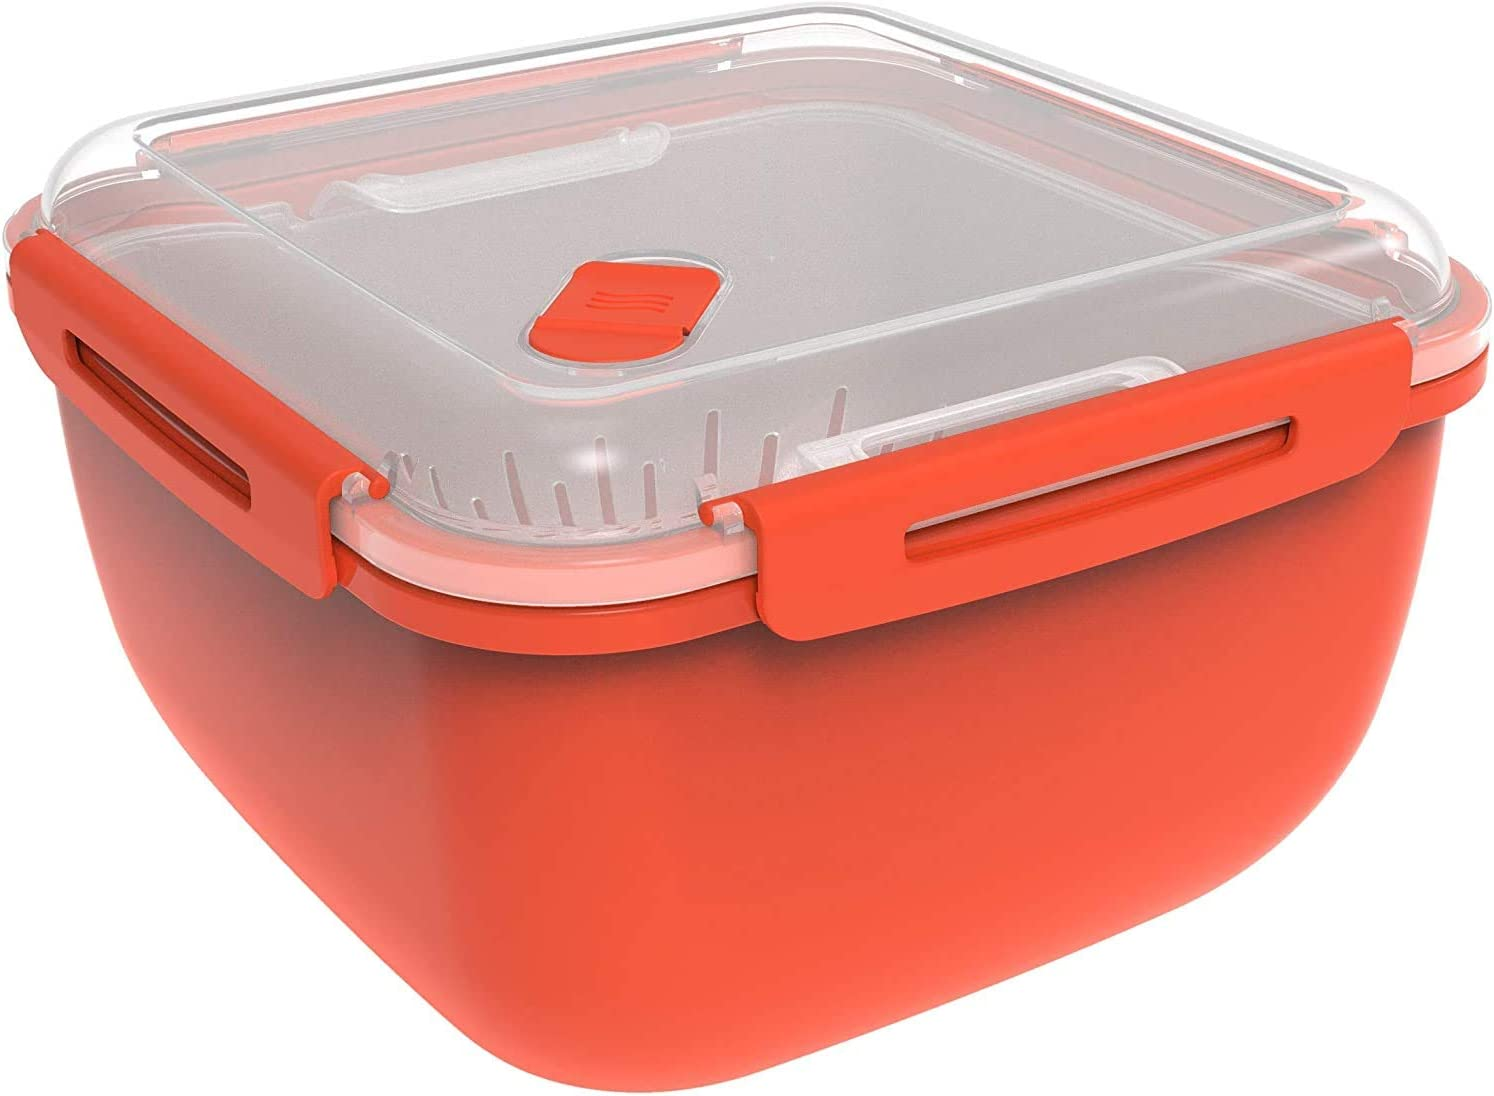 Rotho Memory Microwave, Vaporizador de 2.5 l con tamiz para microondas y vaporizador, Plástico PP sin BPA, rojo, transparente, 2.5l 19.5 x 19.5 x 12.1 cm